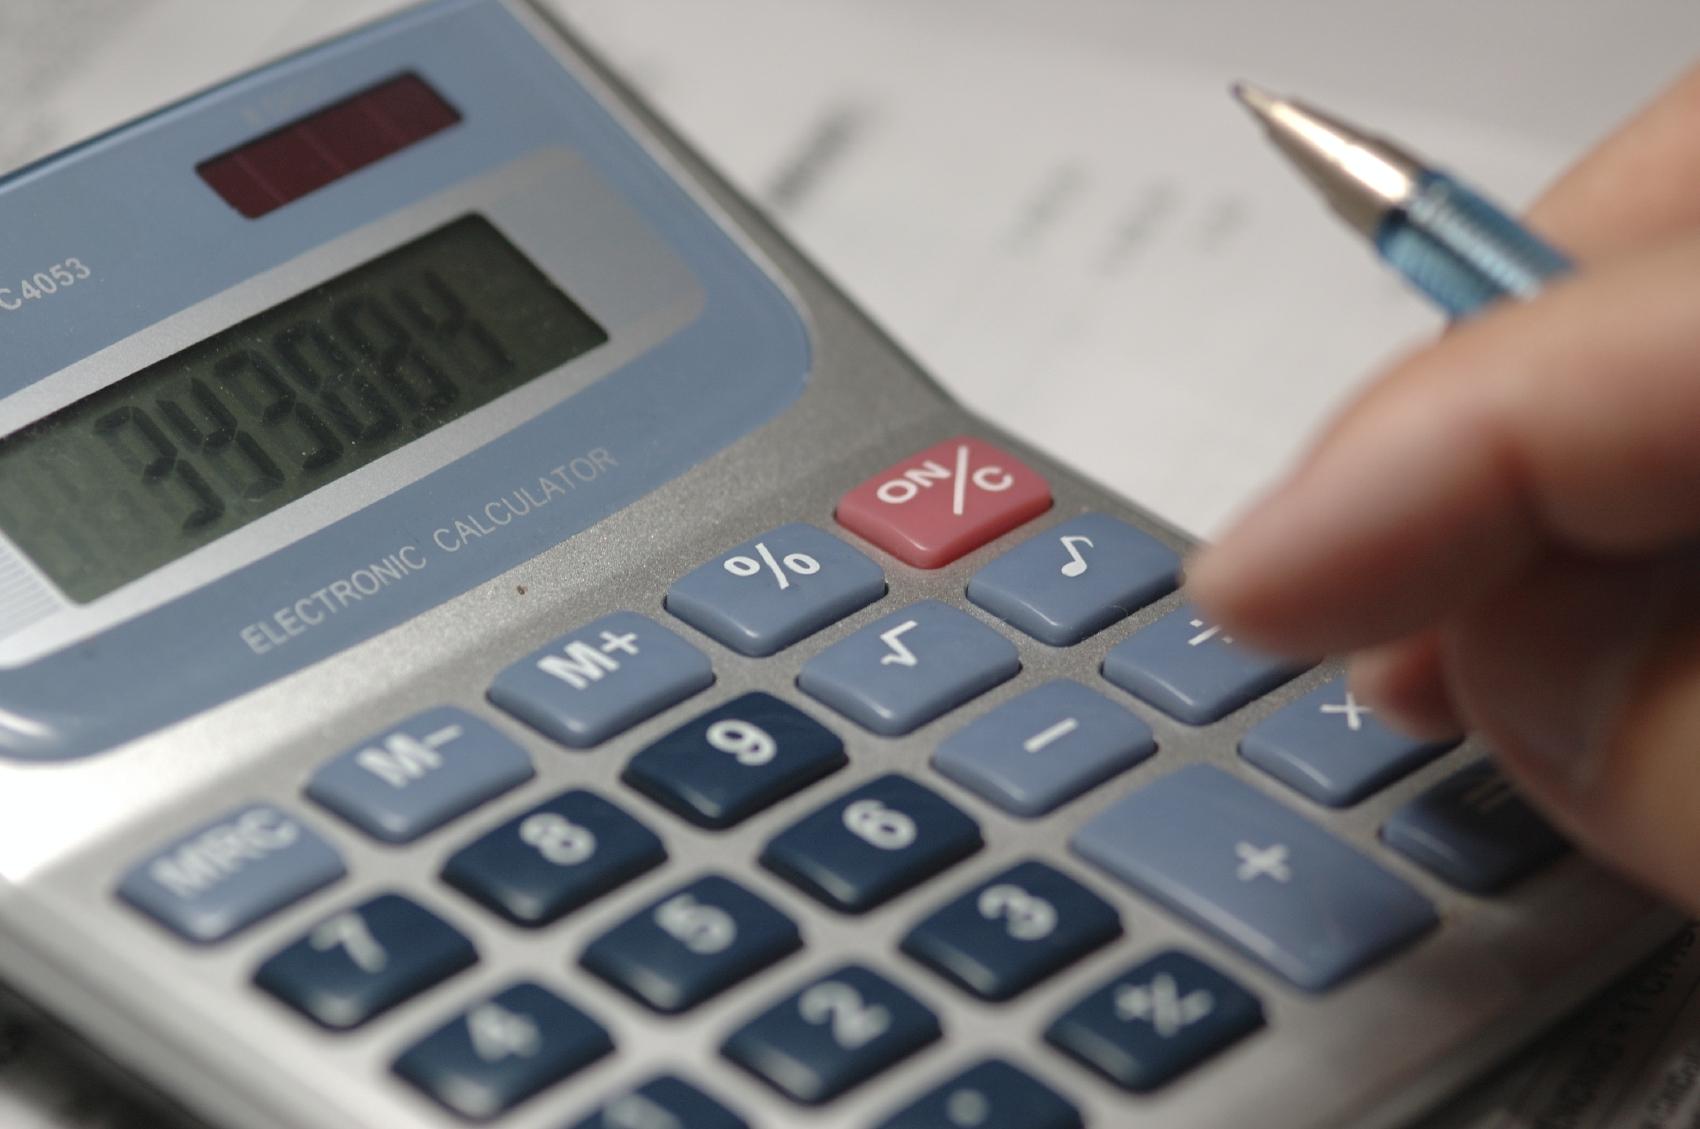 Banco central disponibiliza calculadora para ajudar com as for Calculadora de redes